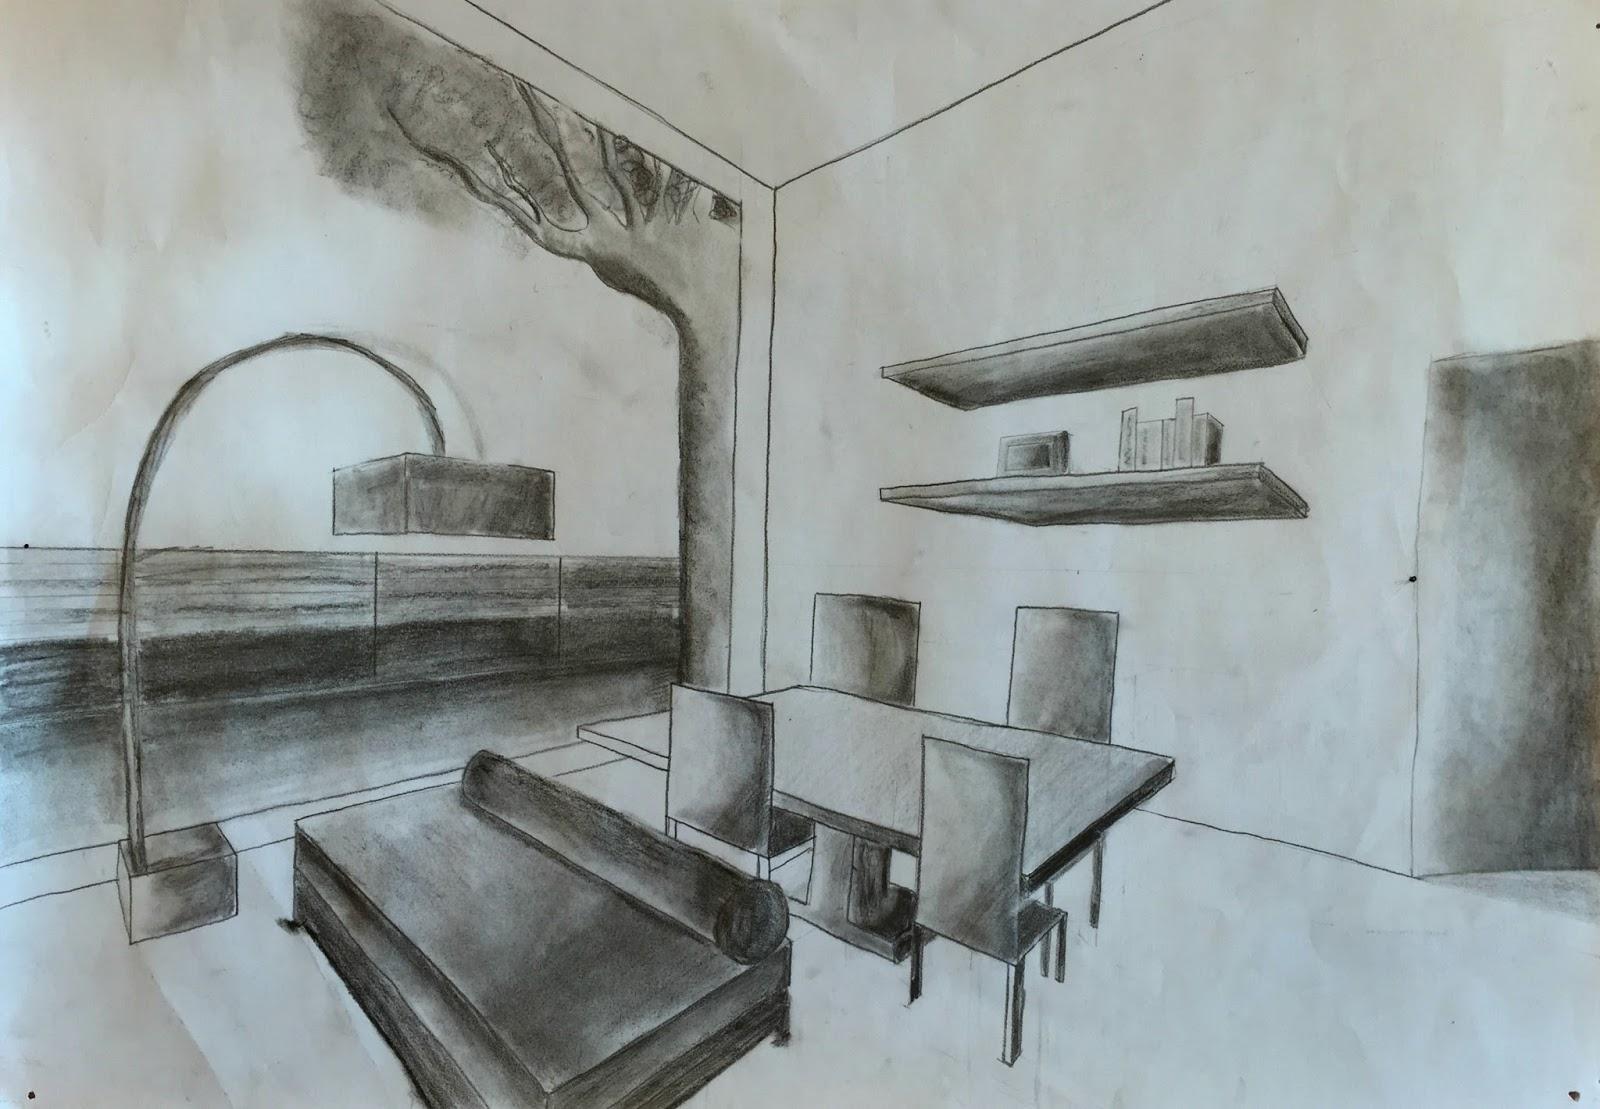 Tu propio l piz dibujo perspectiva for Comedor para dibujar